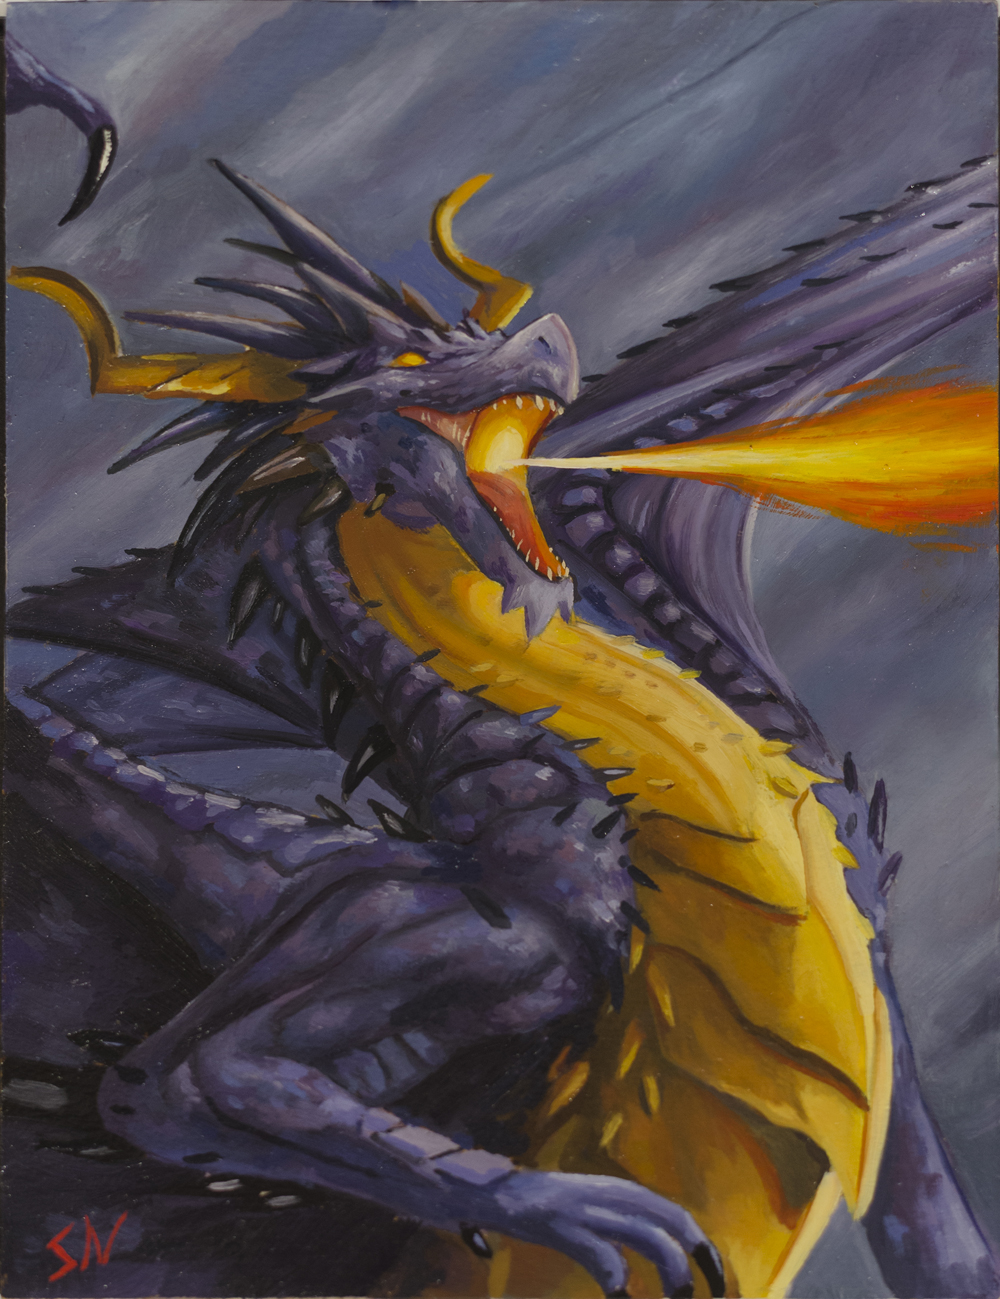 dragon7_StephenNajarian